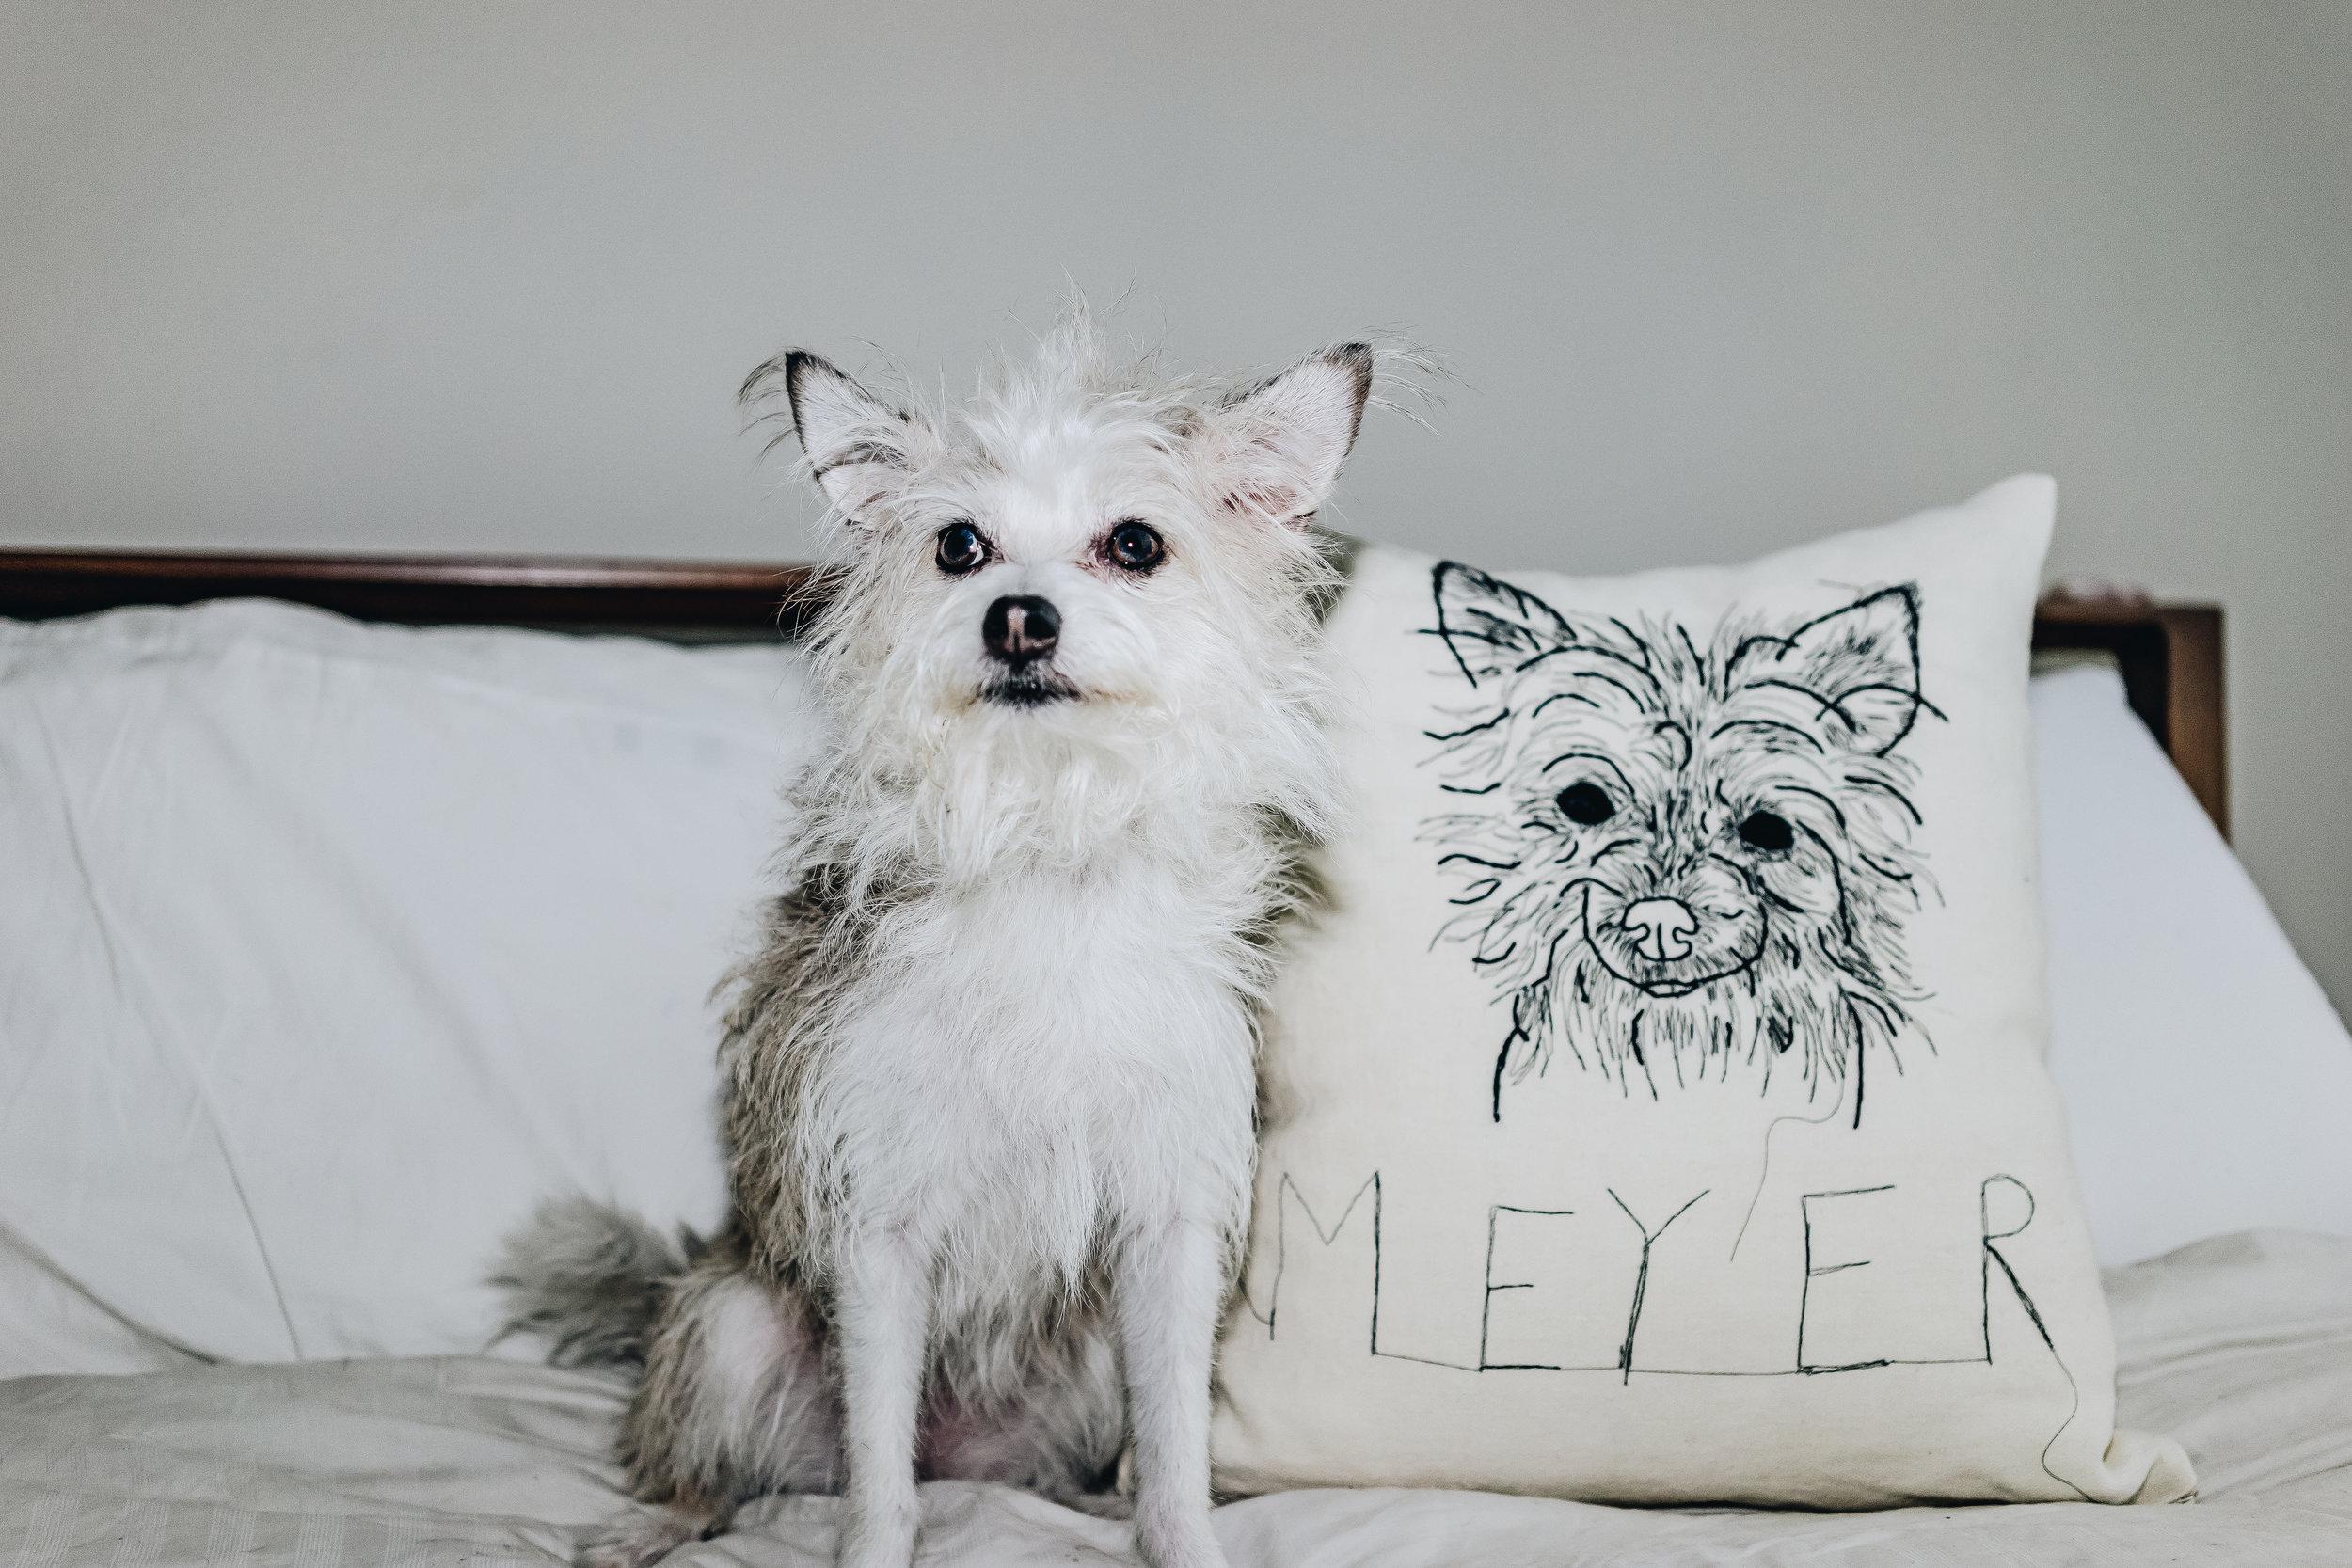 meyer and pillow 2.jpg